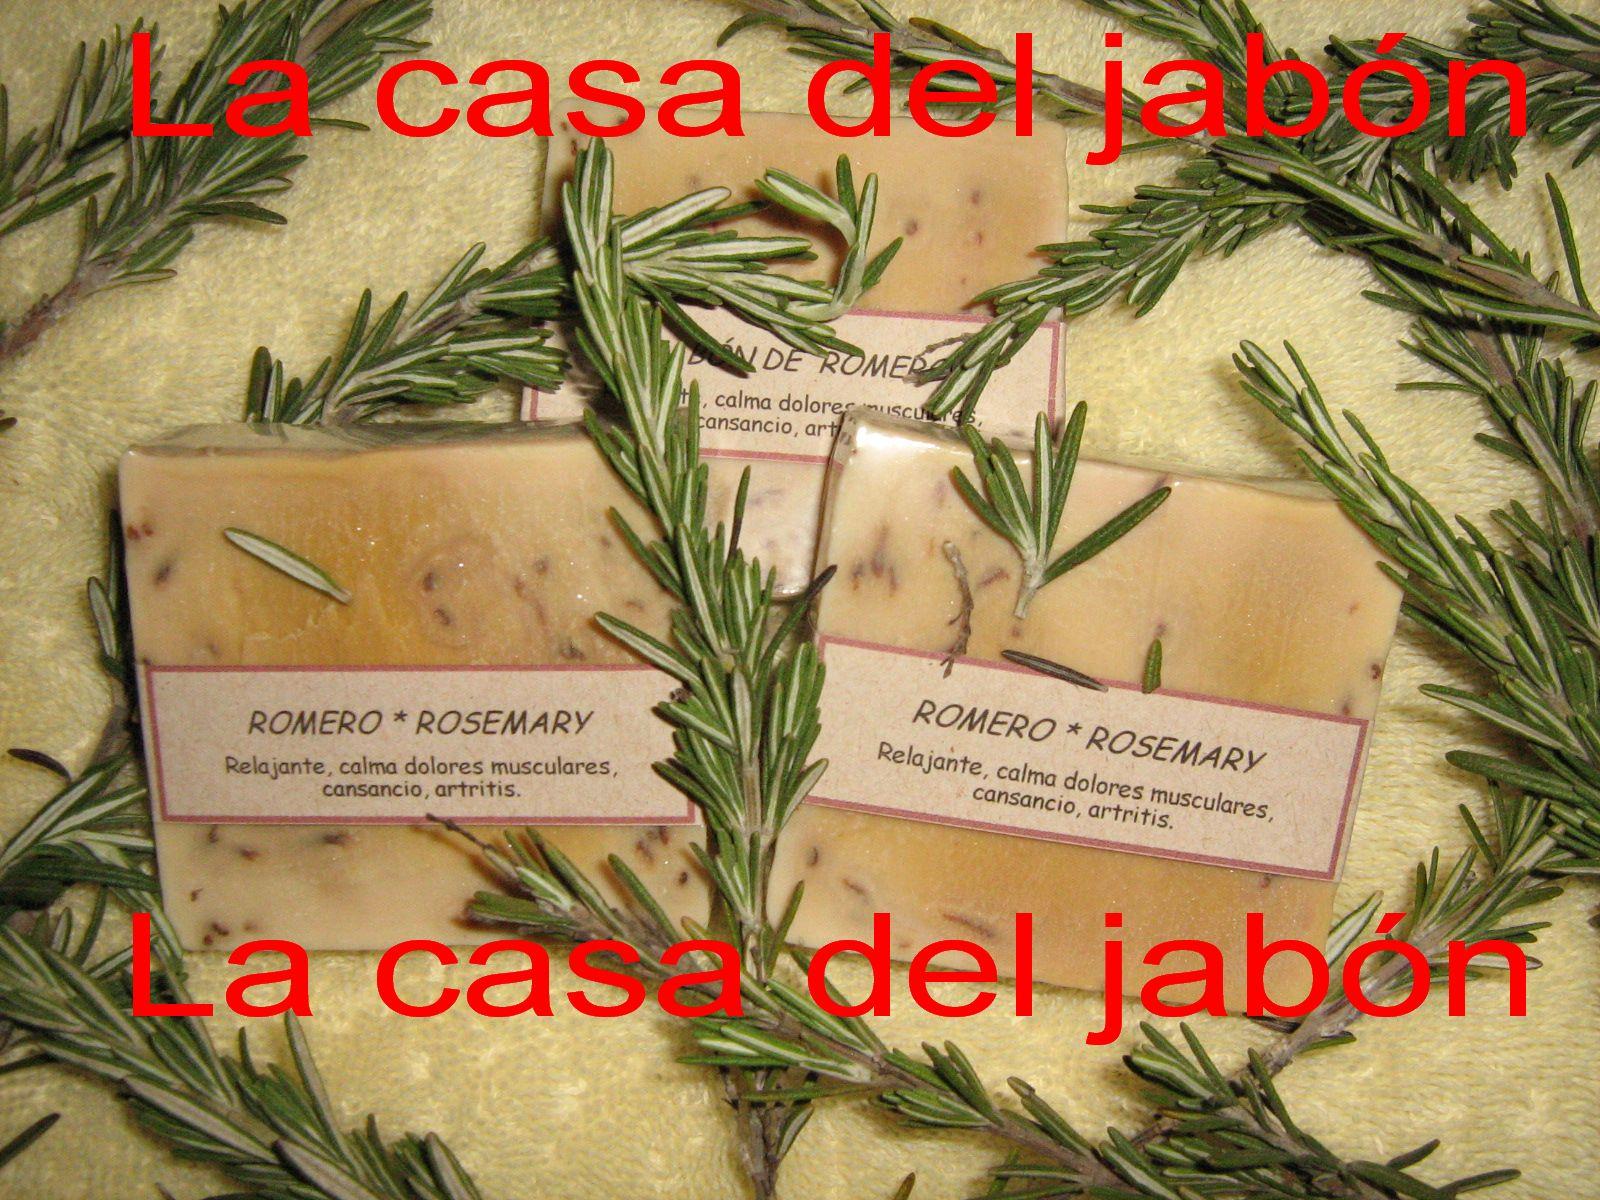 La casa del jab n jab n de romero rosemary soap for La despensa del jabon opiniones